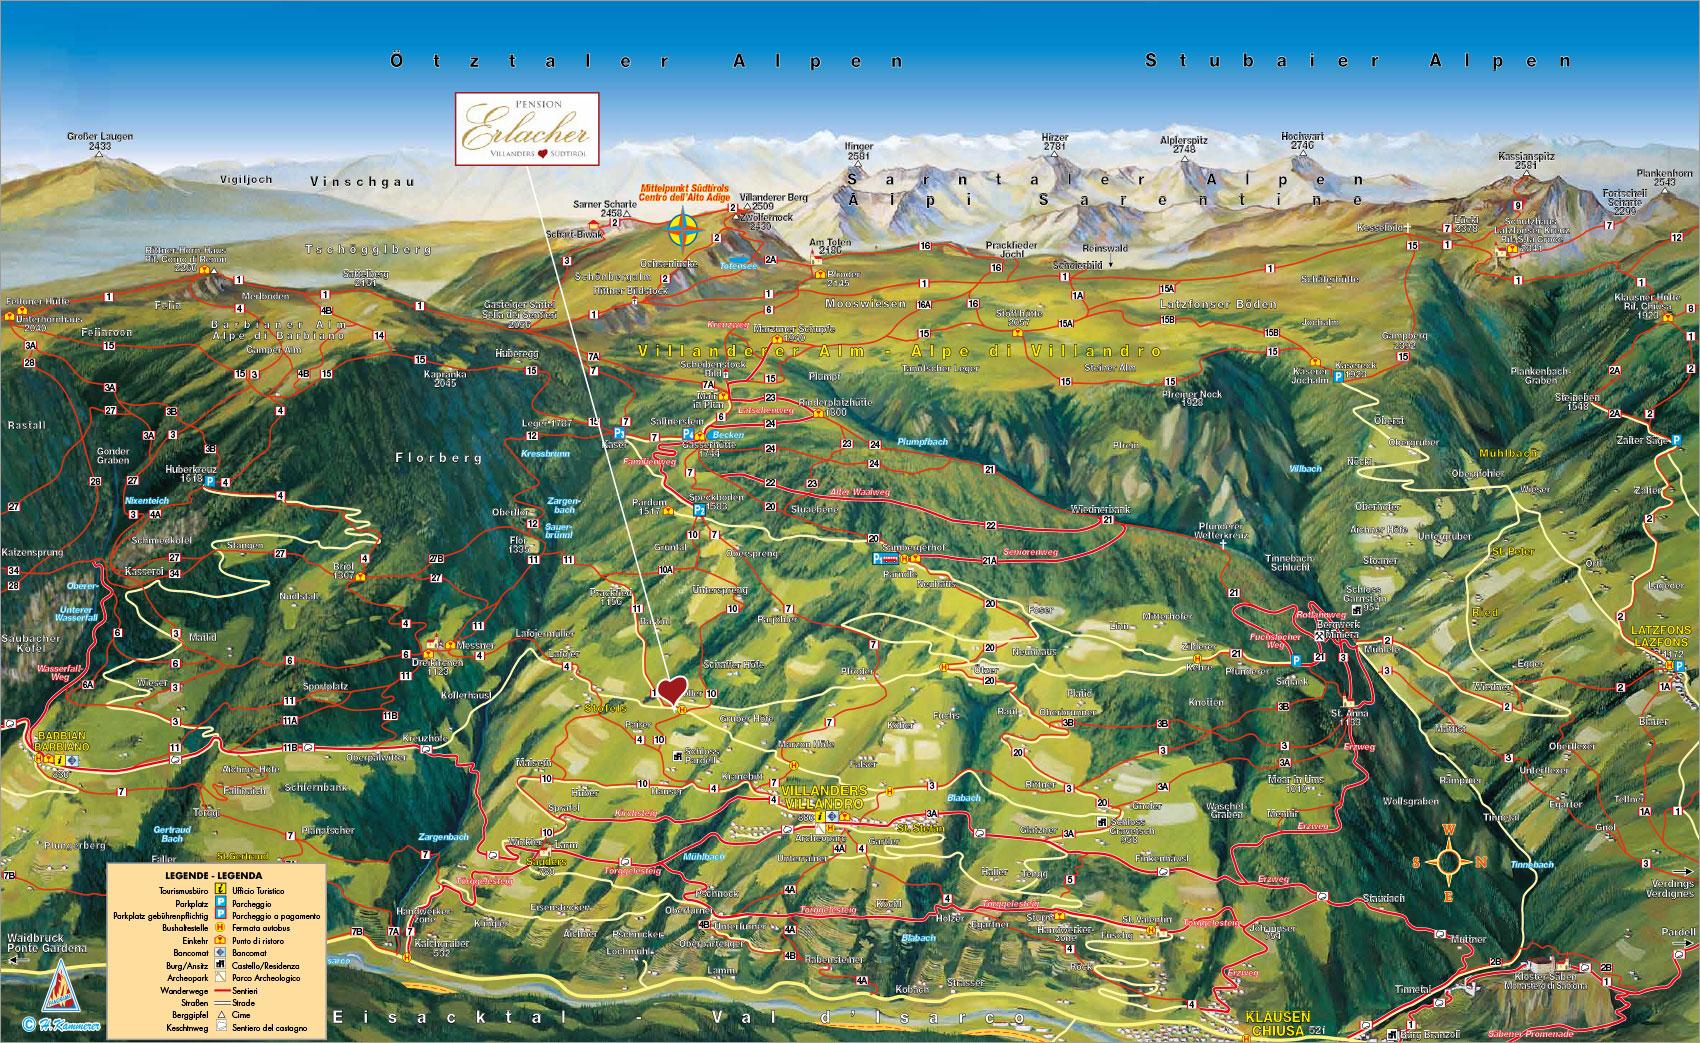 Wanderkarte Sommer Pension Im Eisacktal Urlaub In Sudtirol